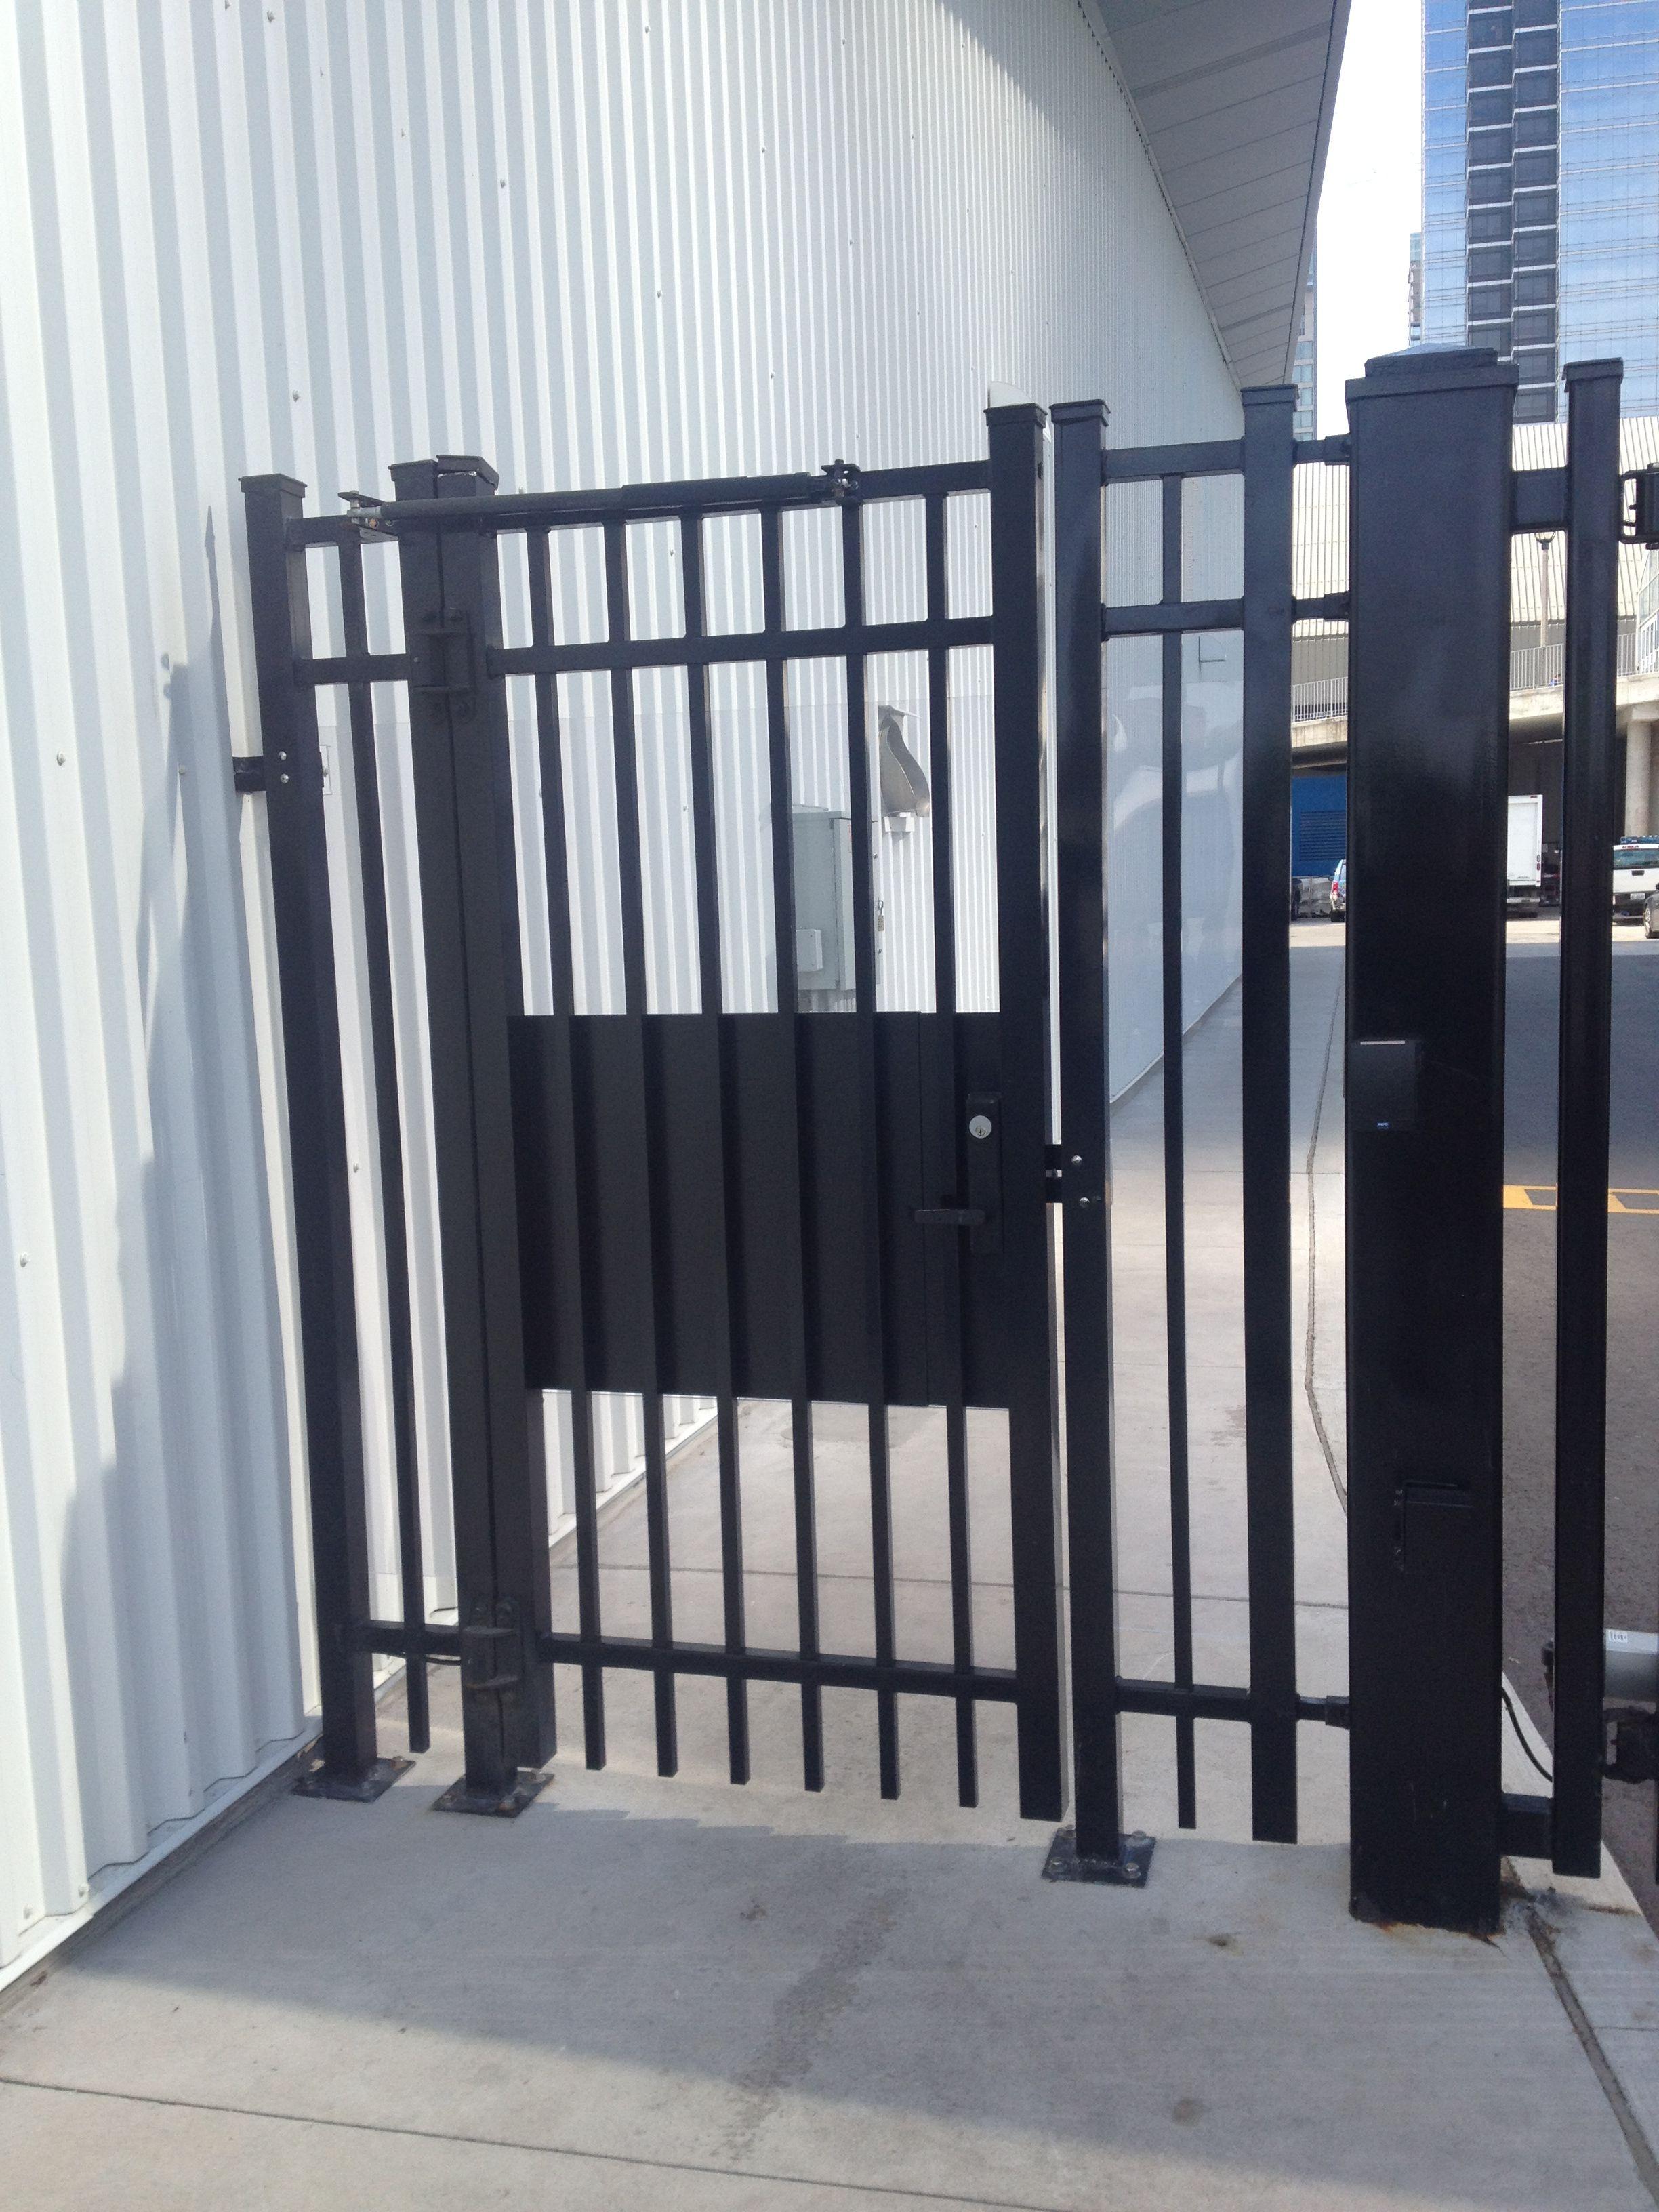 Panic Hardware With Security Lock And Hydraulic Closer Security Locks Gate Design Gate Locks